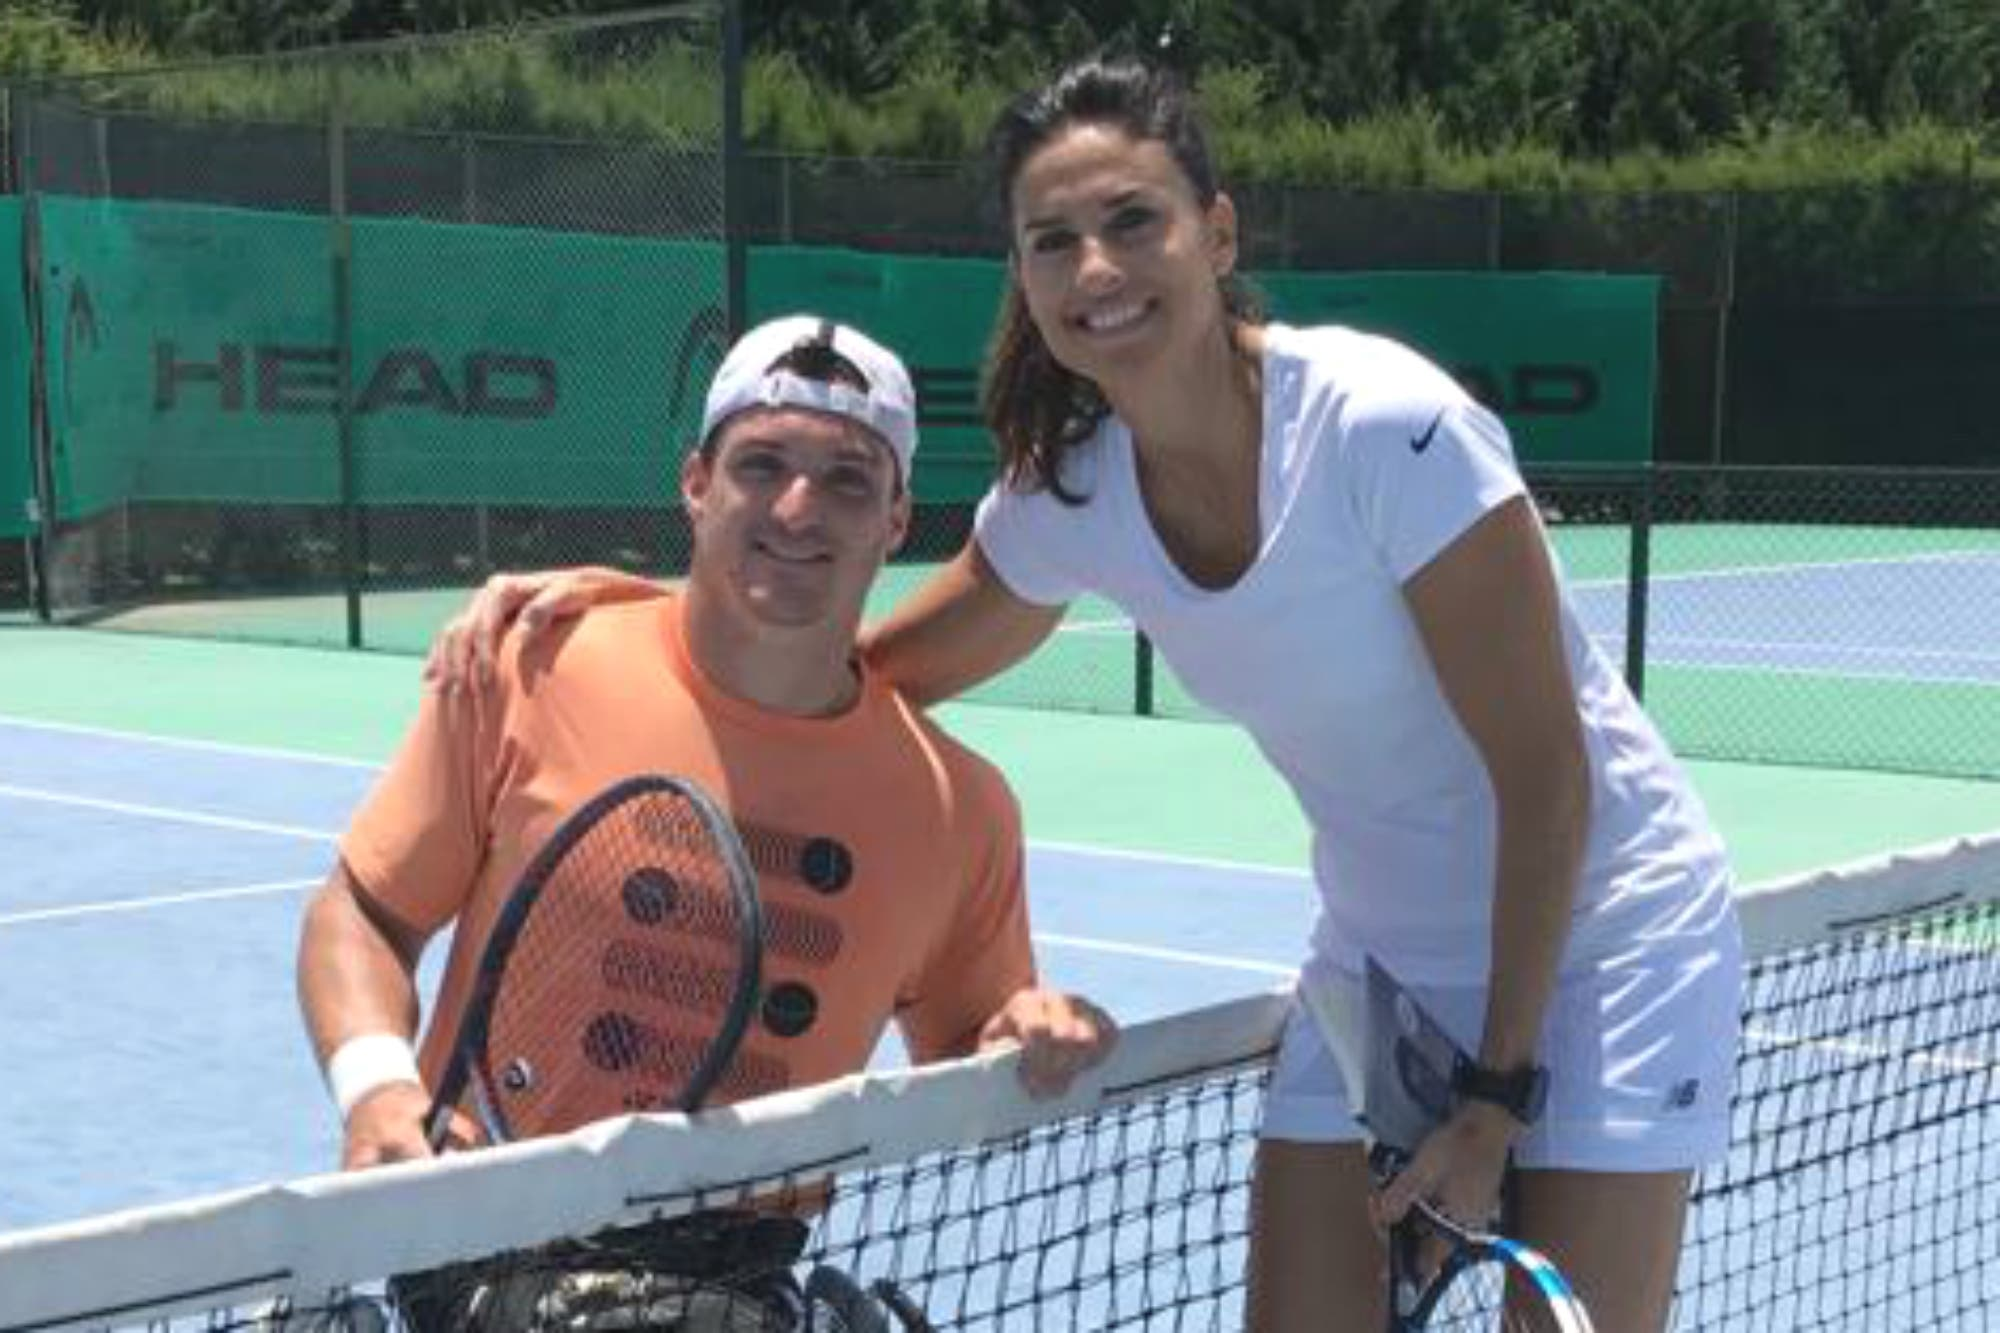 Gusti Fernández cumplió un sueño: pelotear con la legendaria Gabriela Sabatini